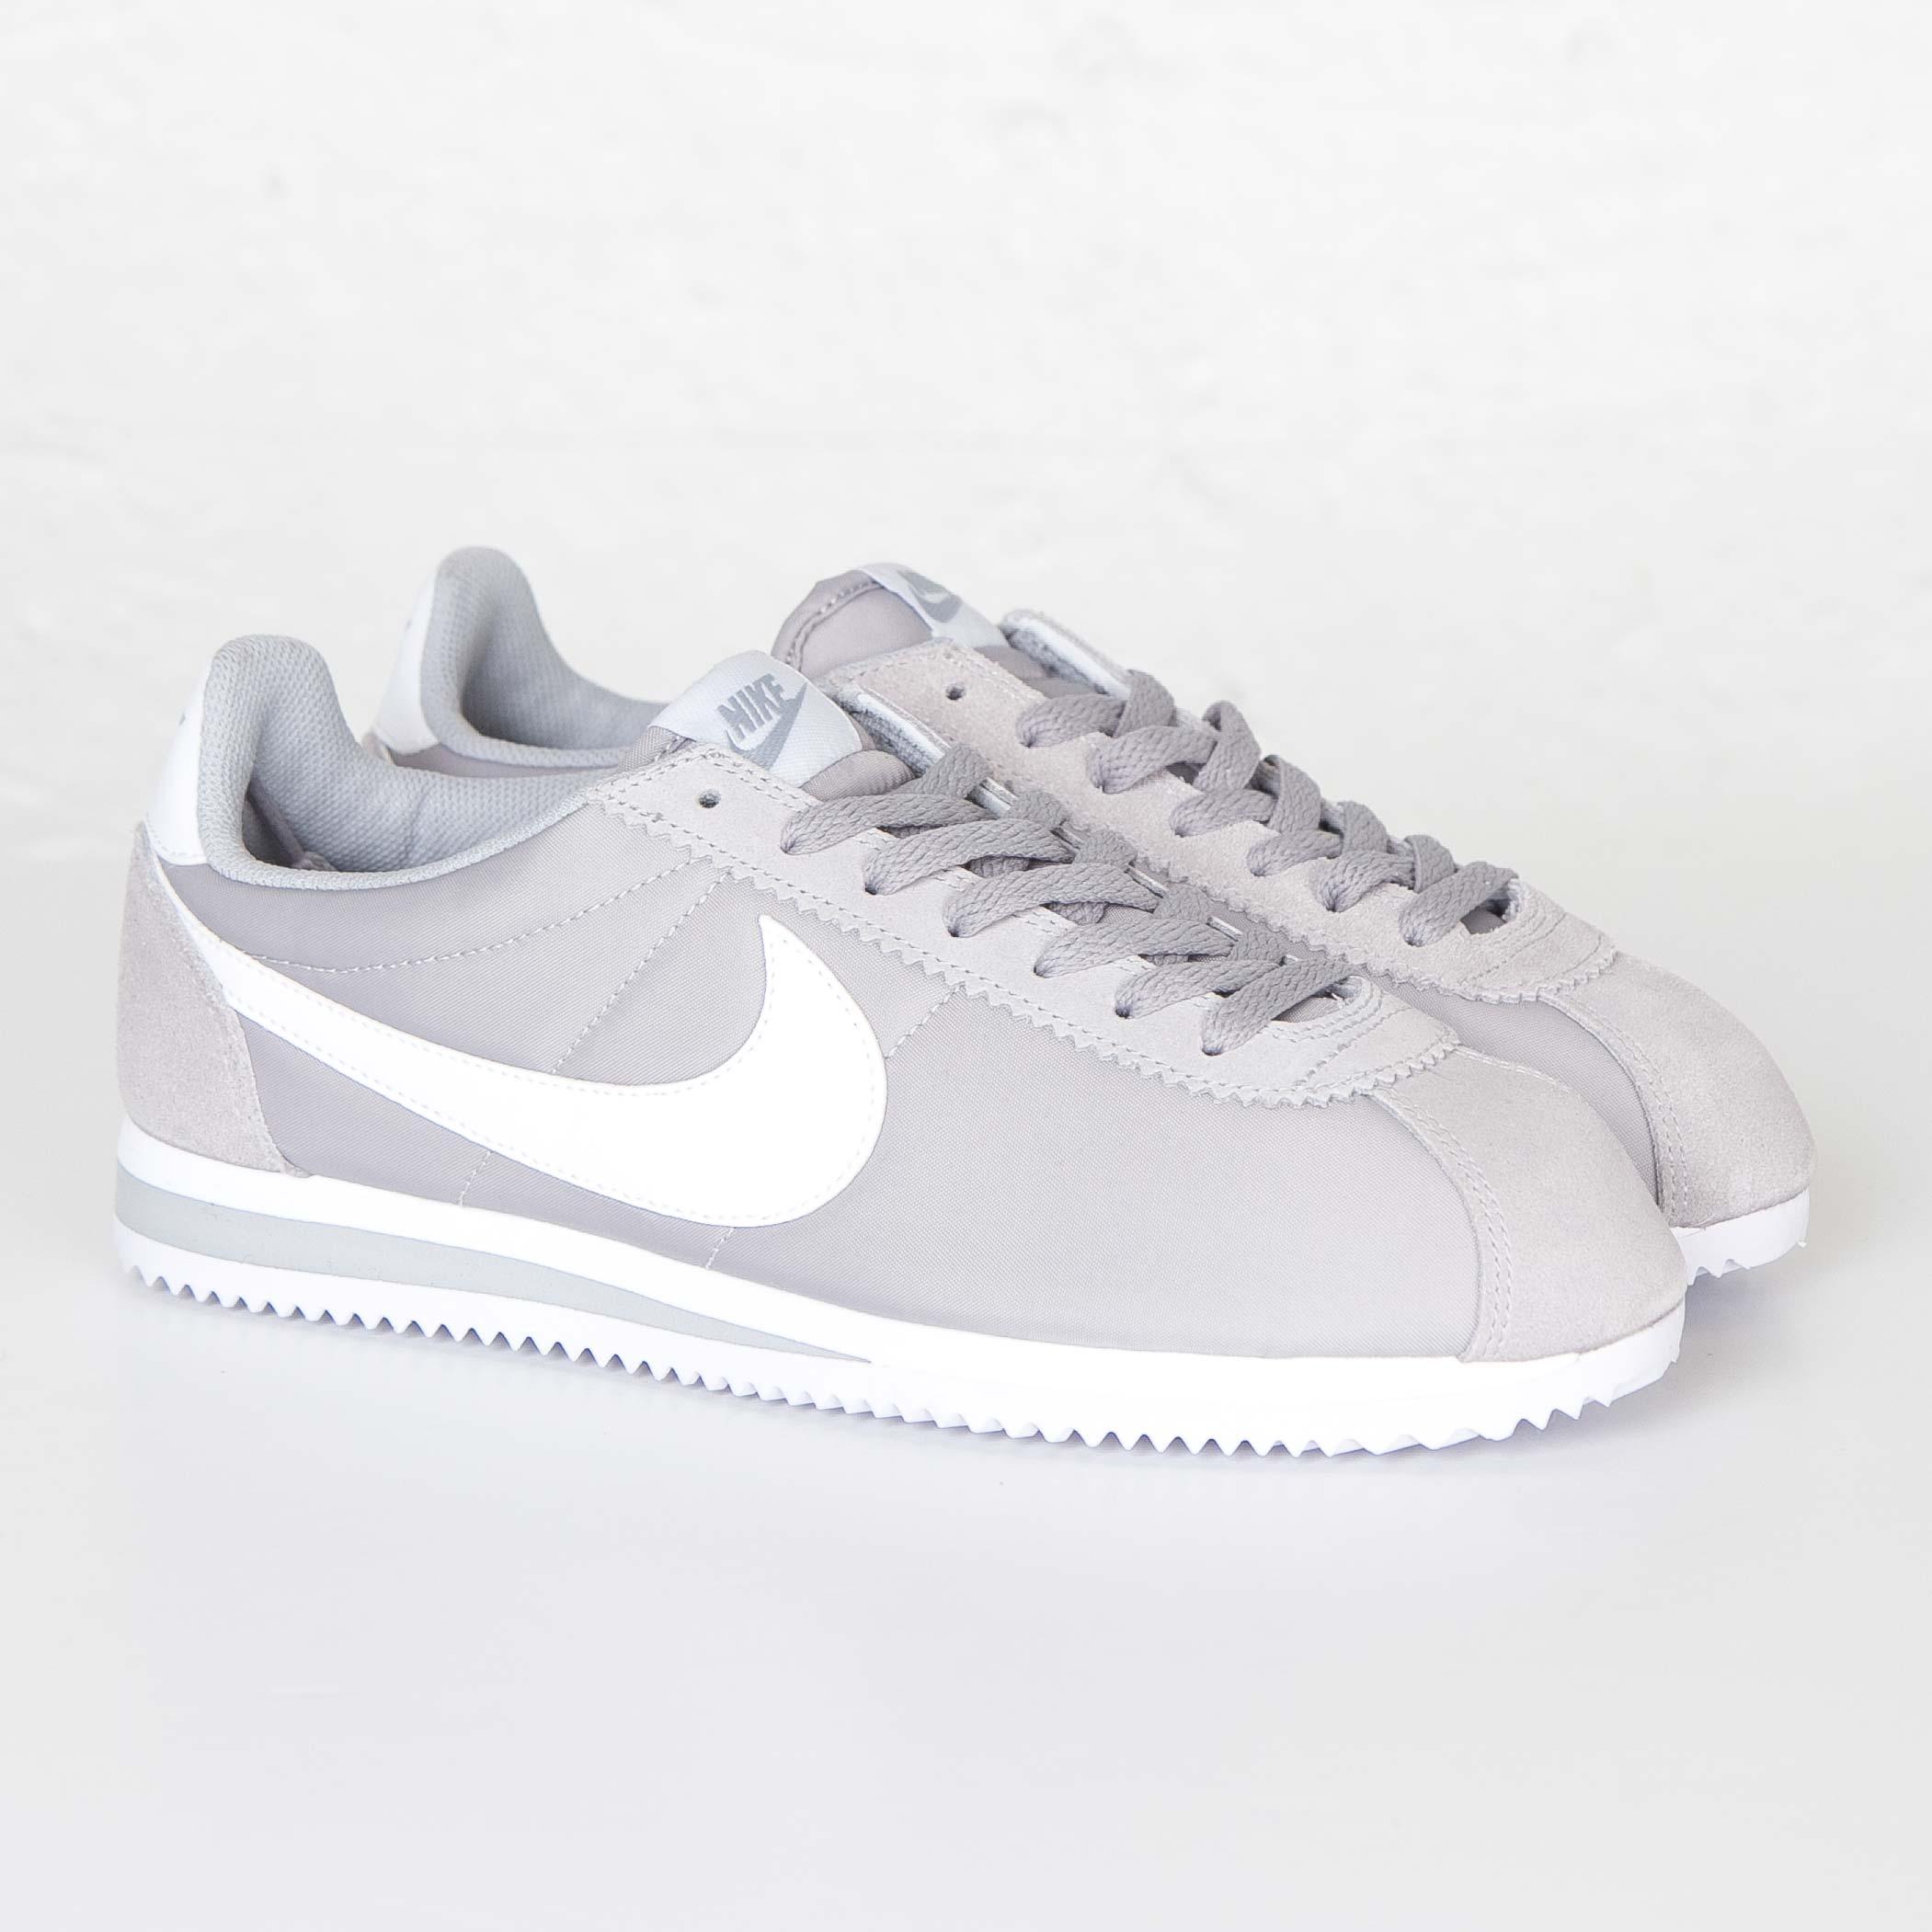 uk availability 13330 a6240 ... gris negro blanco retro zapatos d0f76 9e938  coupon code for nike  classic cortez nylon 6394d a66fb